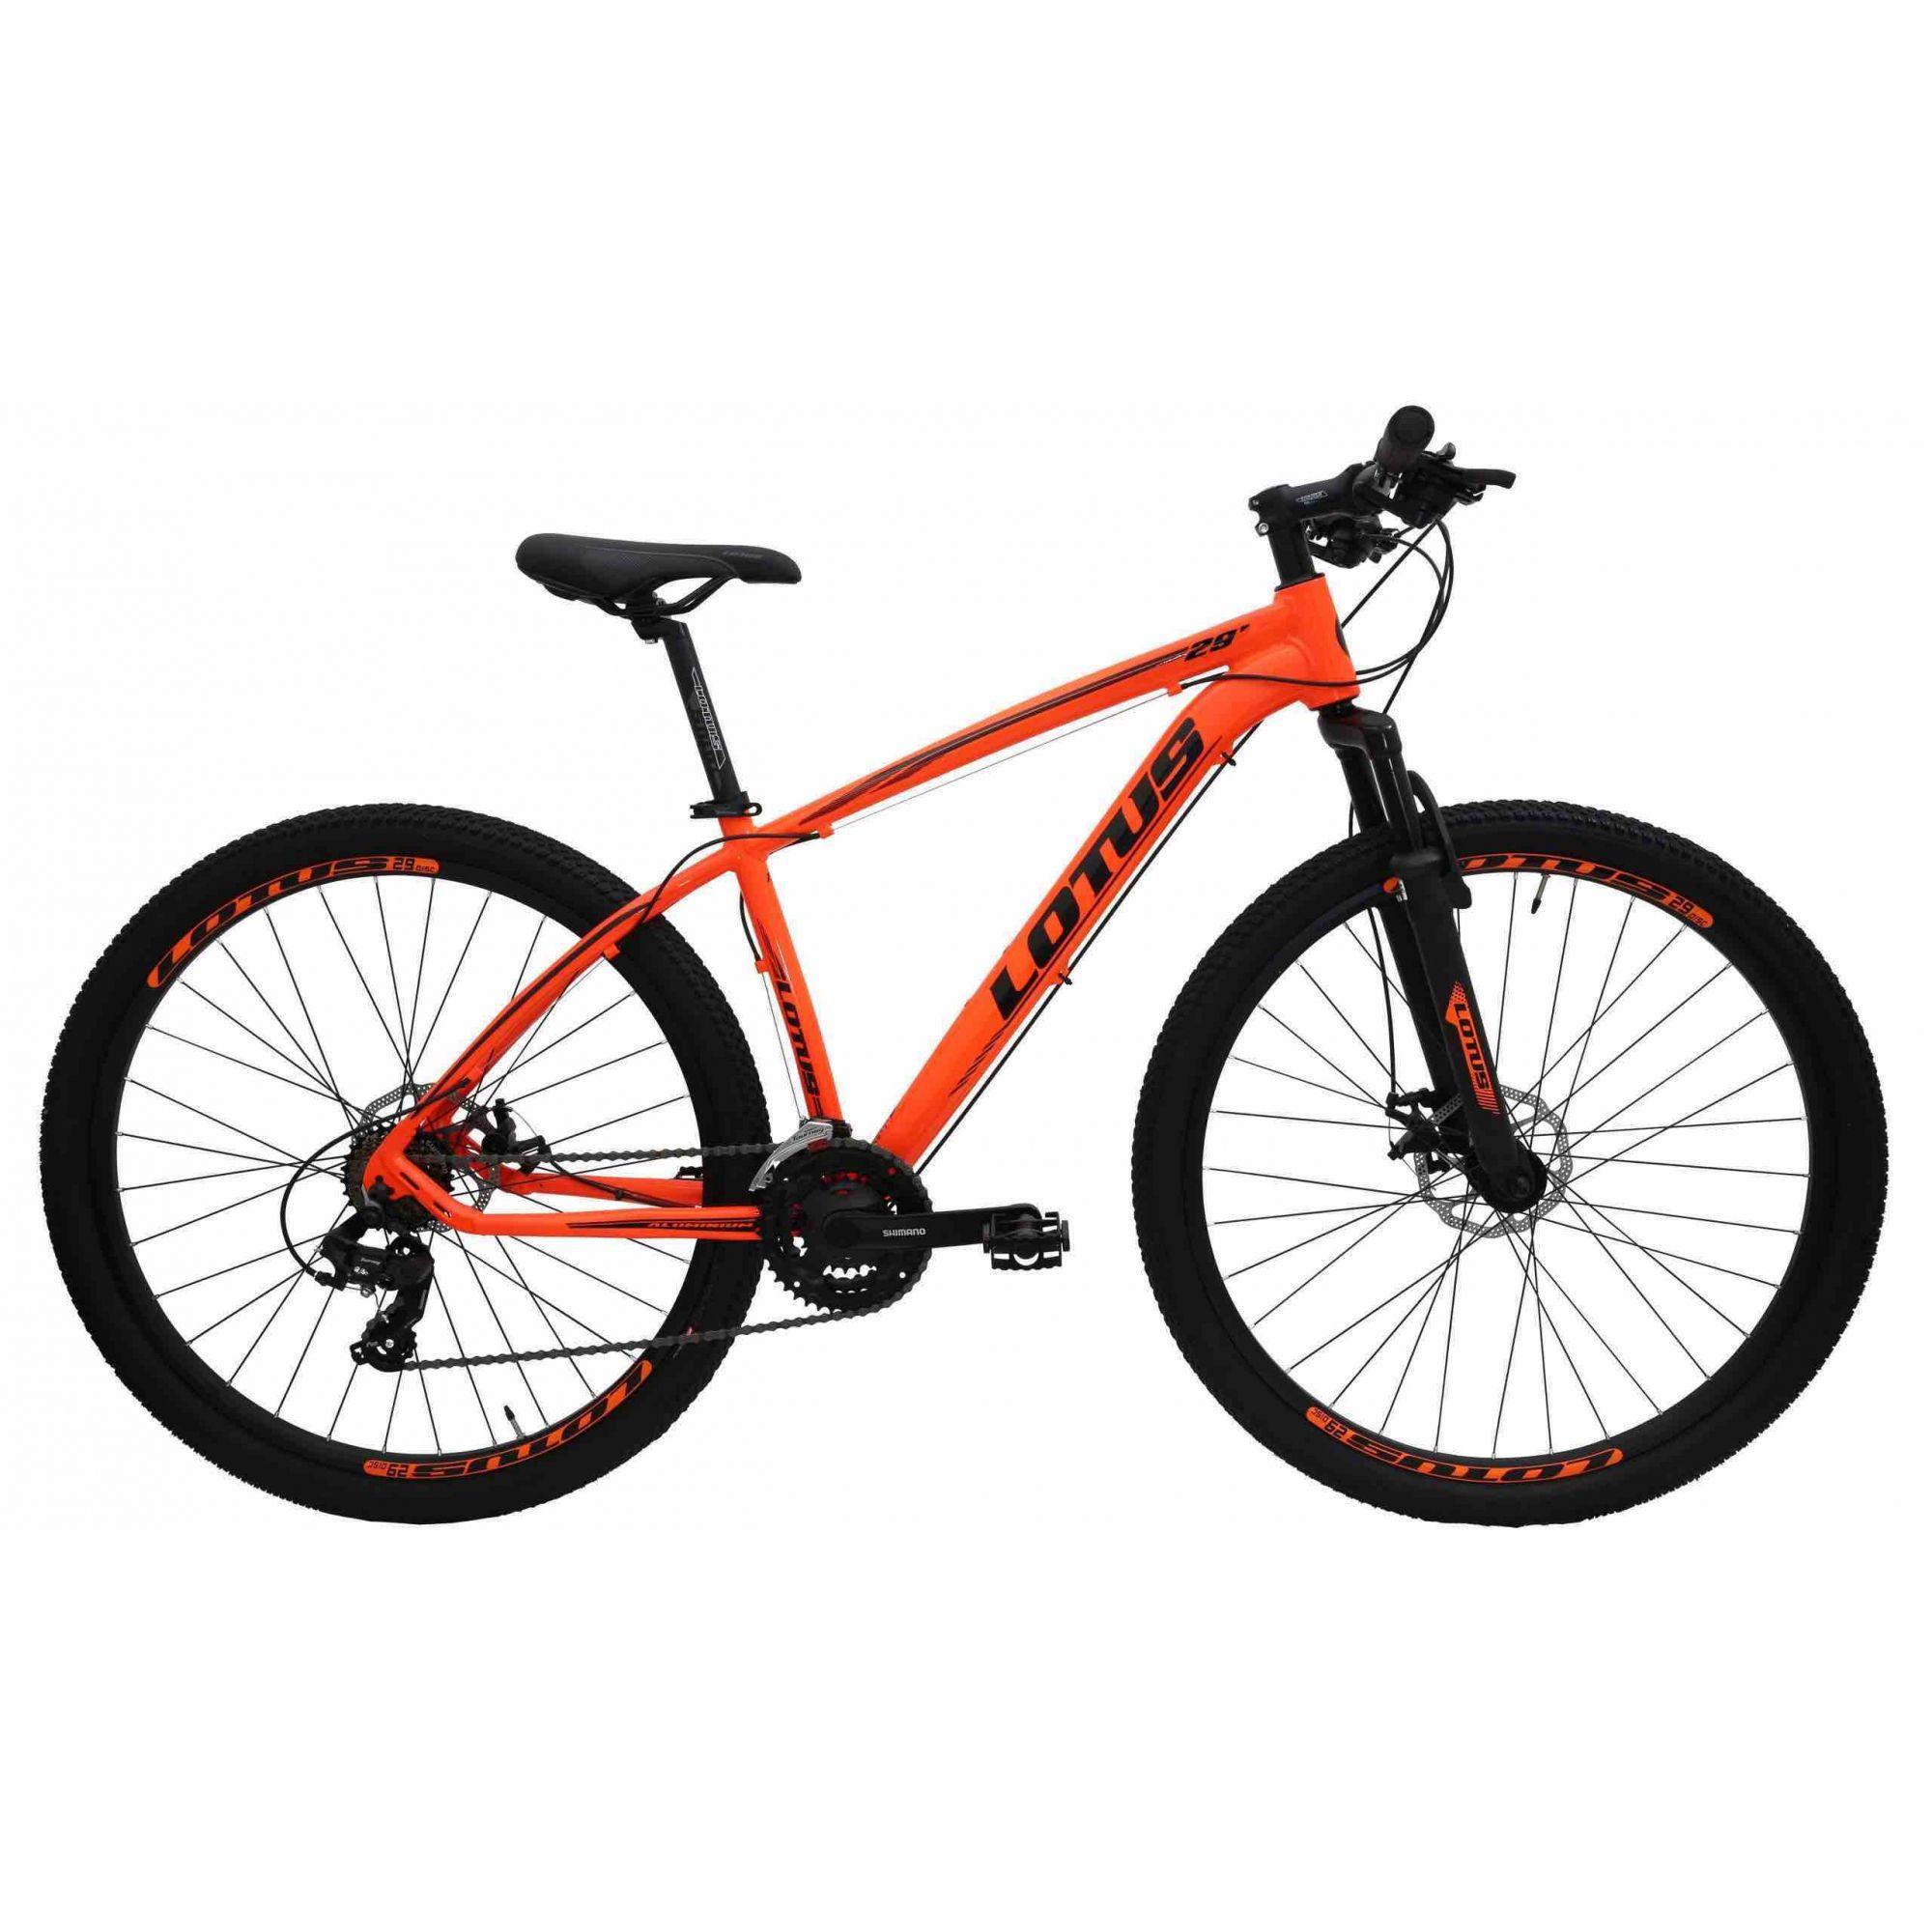 Bicicleta Aro 29 Bike Lotus ? ALUMINIUM Vermelho/Preto 318560